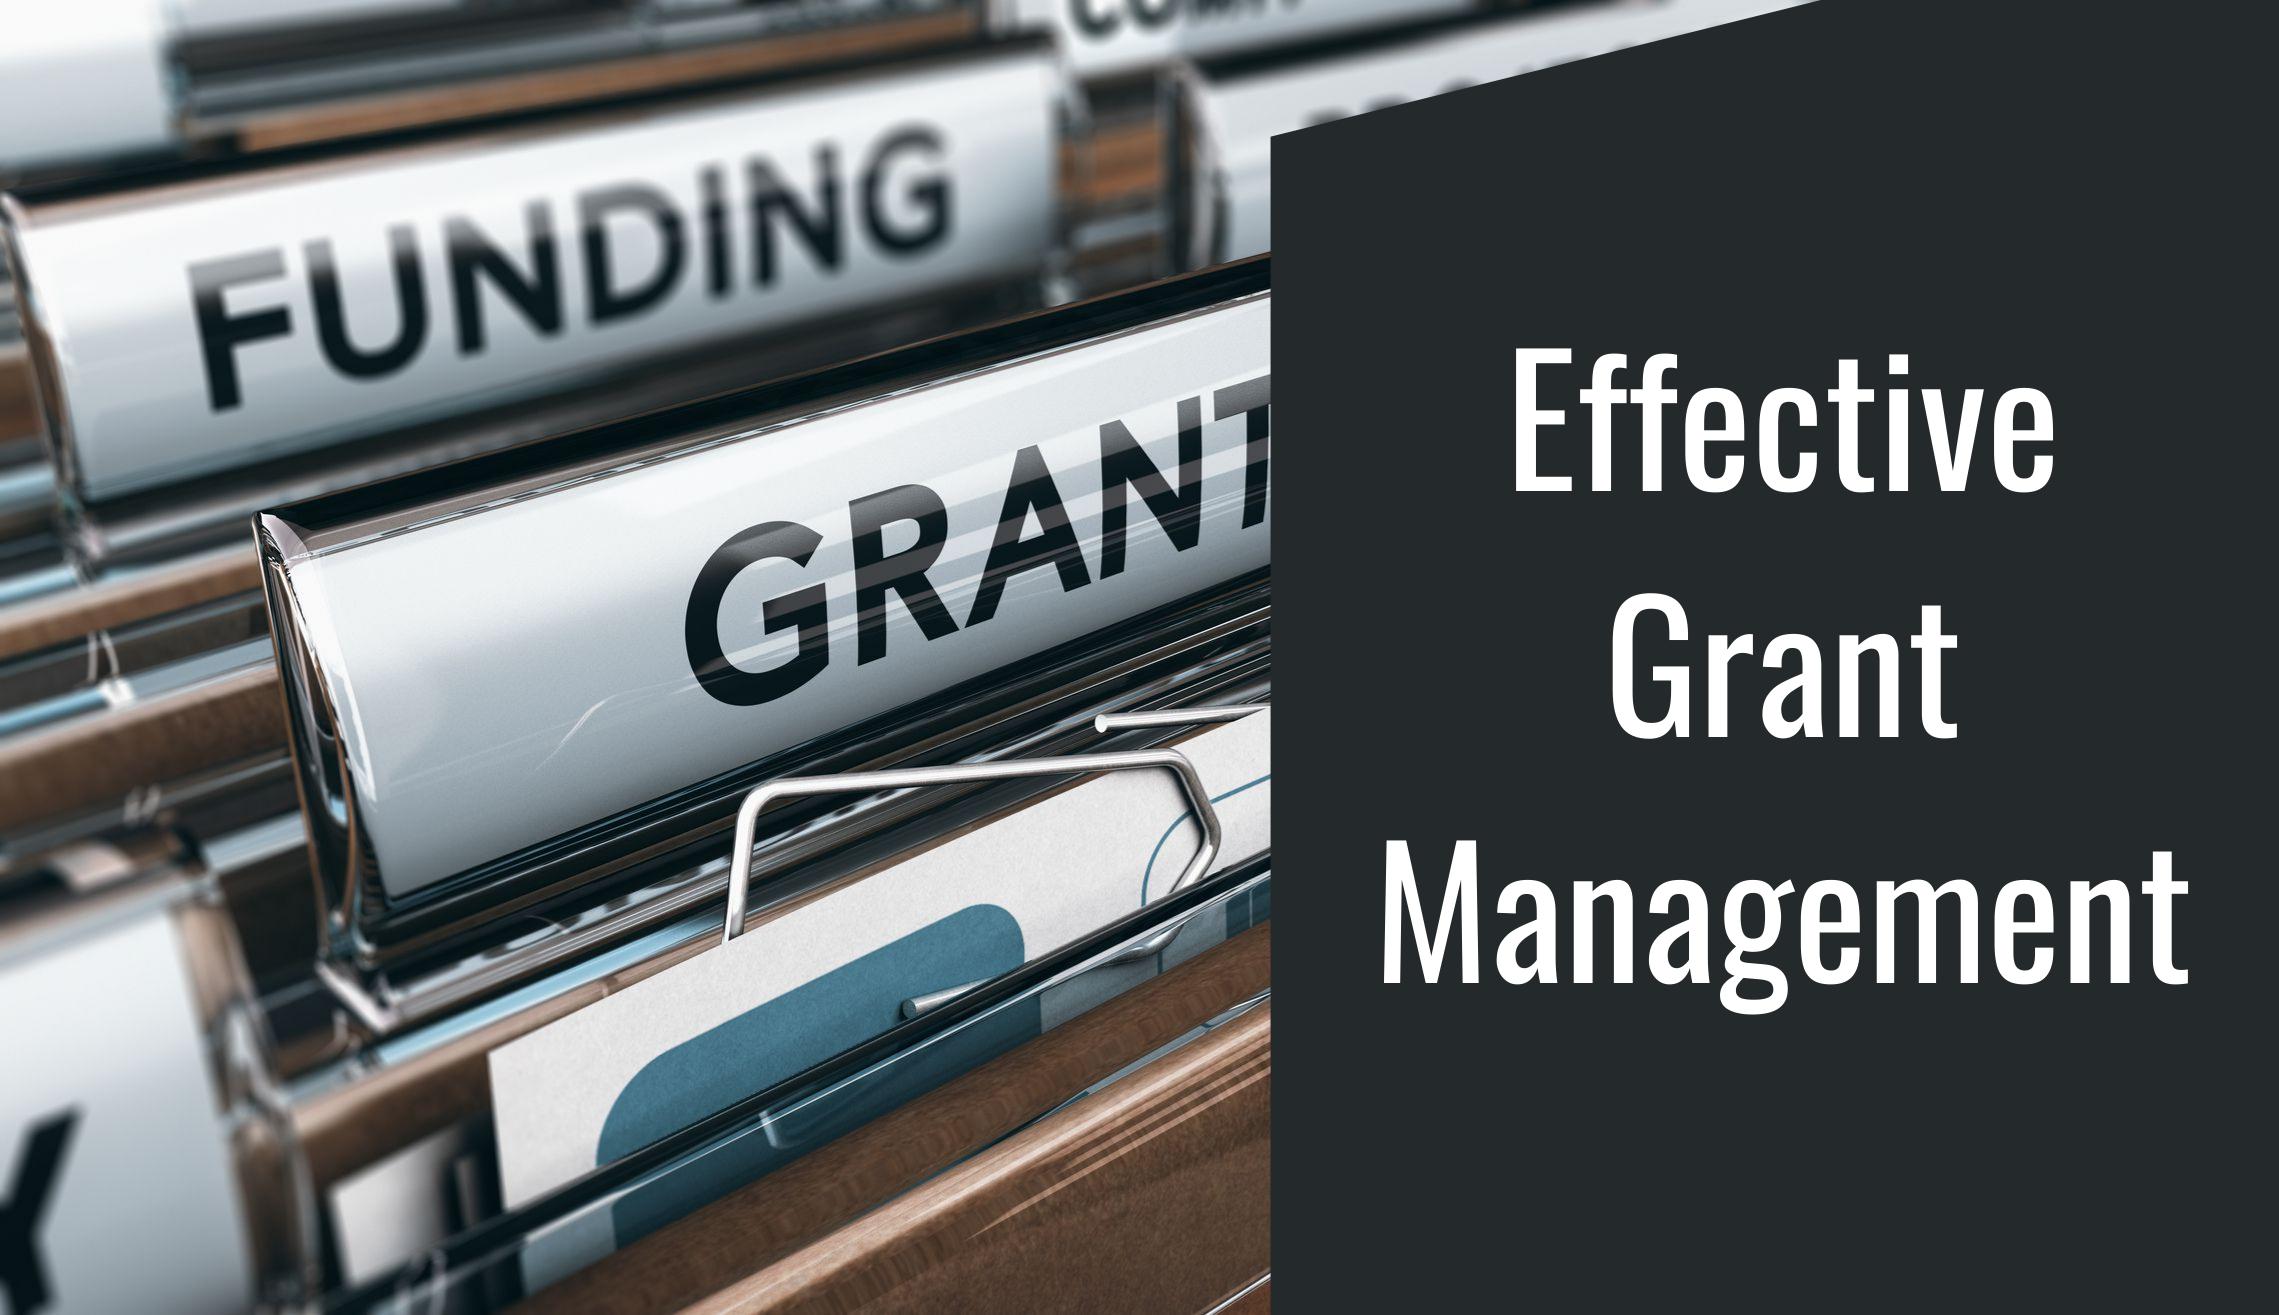 Effective Grant Management